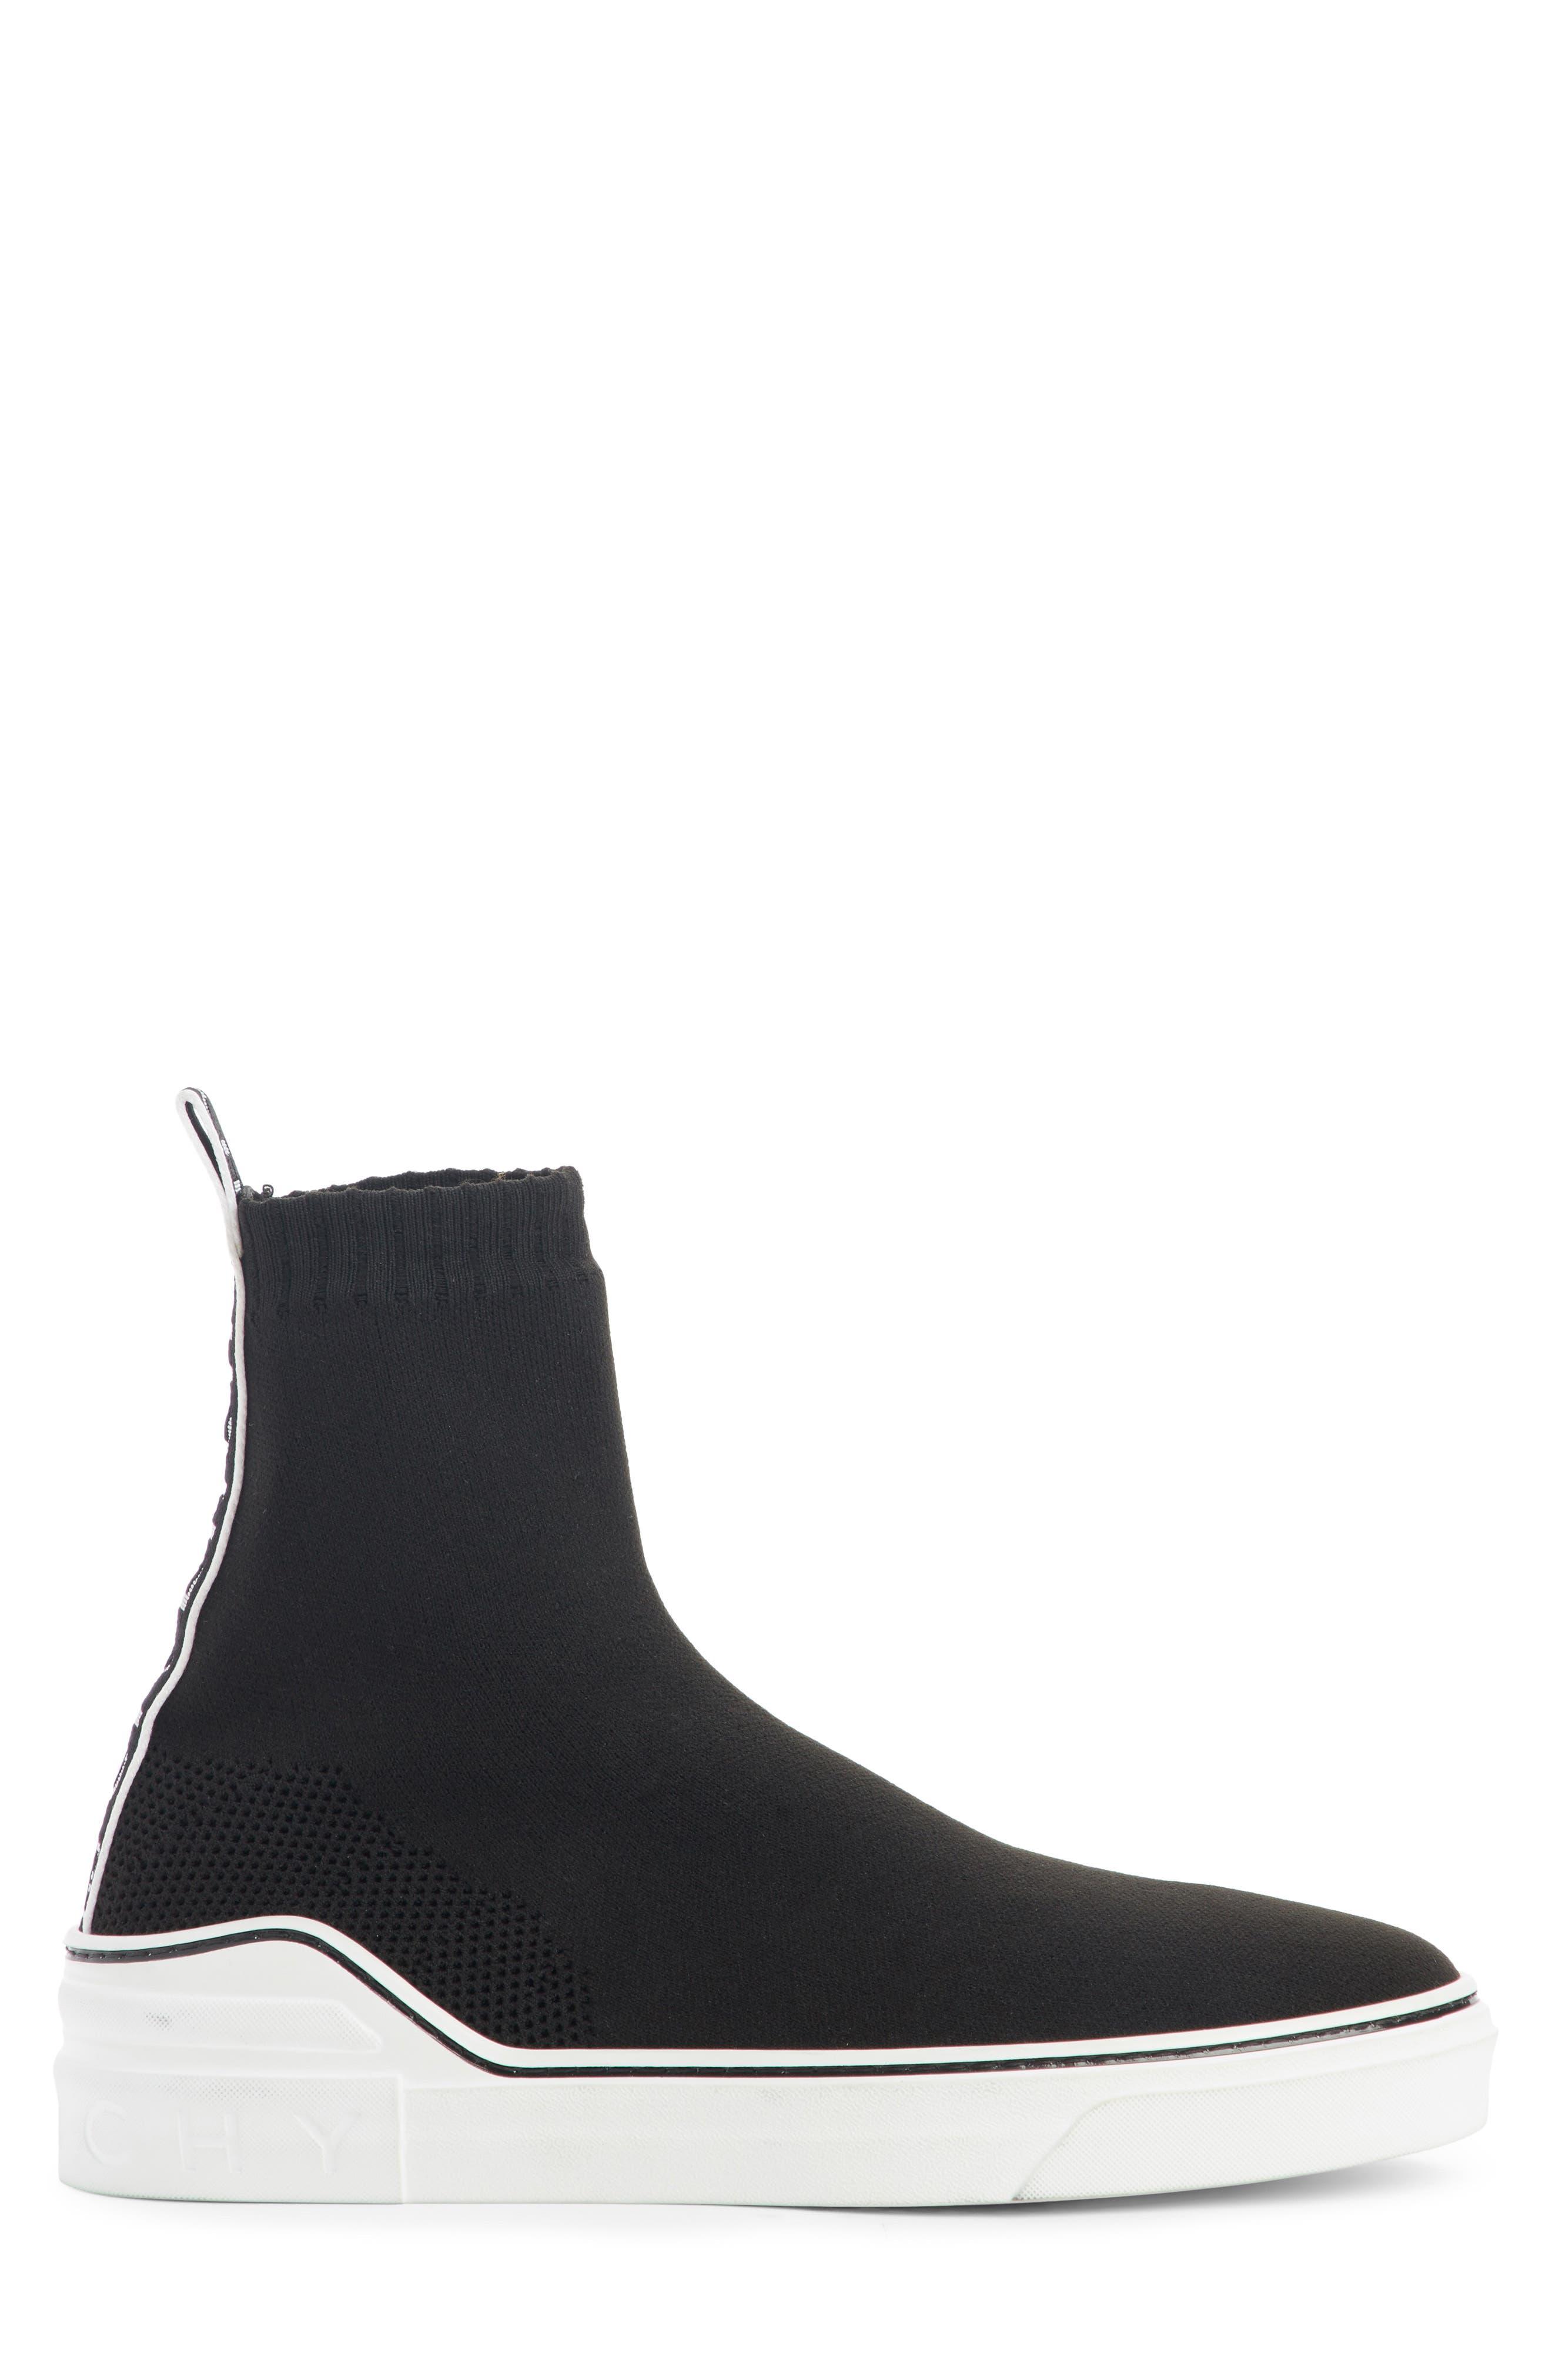 George V Hi Sock Sneaker,                             Alternate thumbnail 3, color,                             001